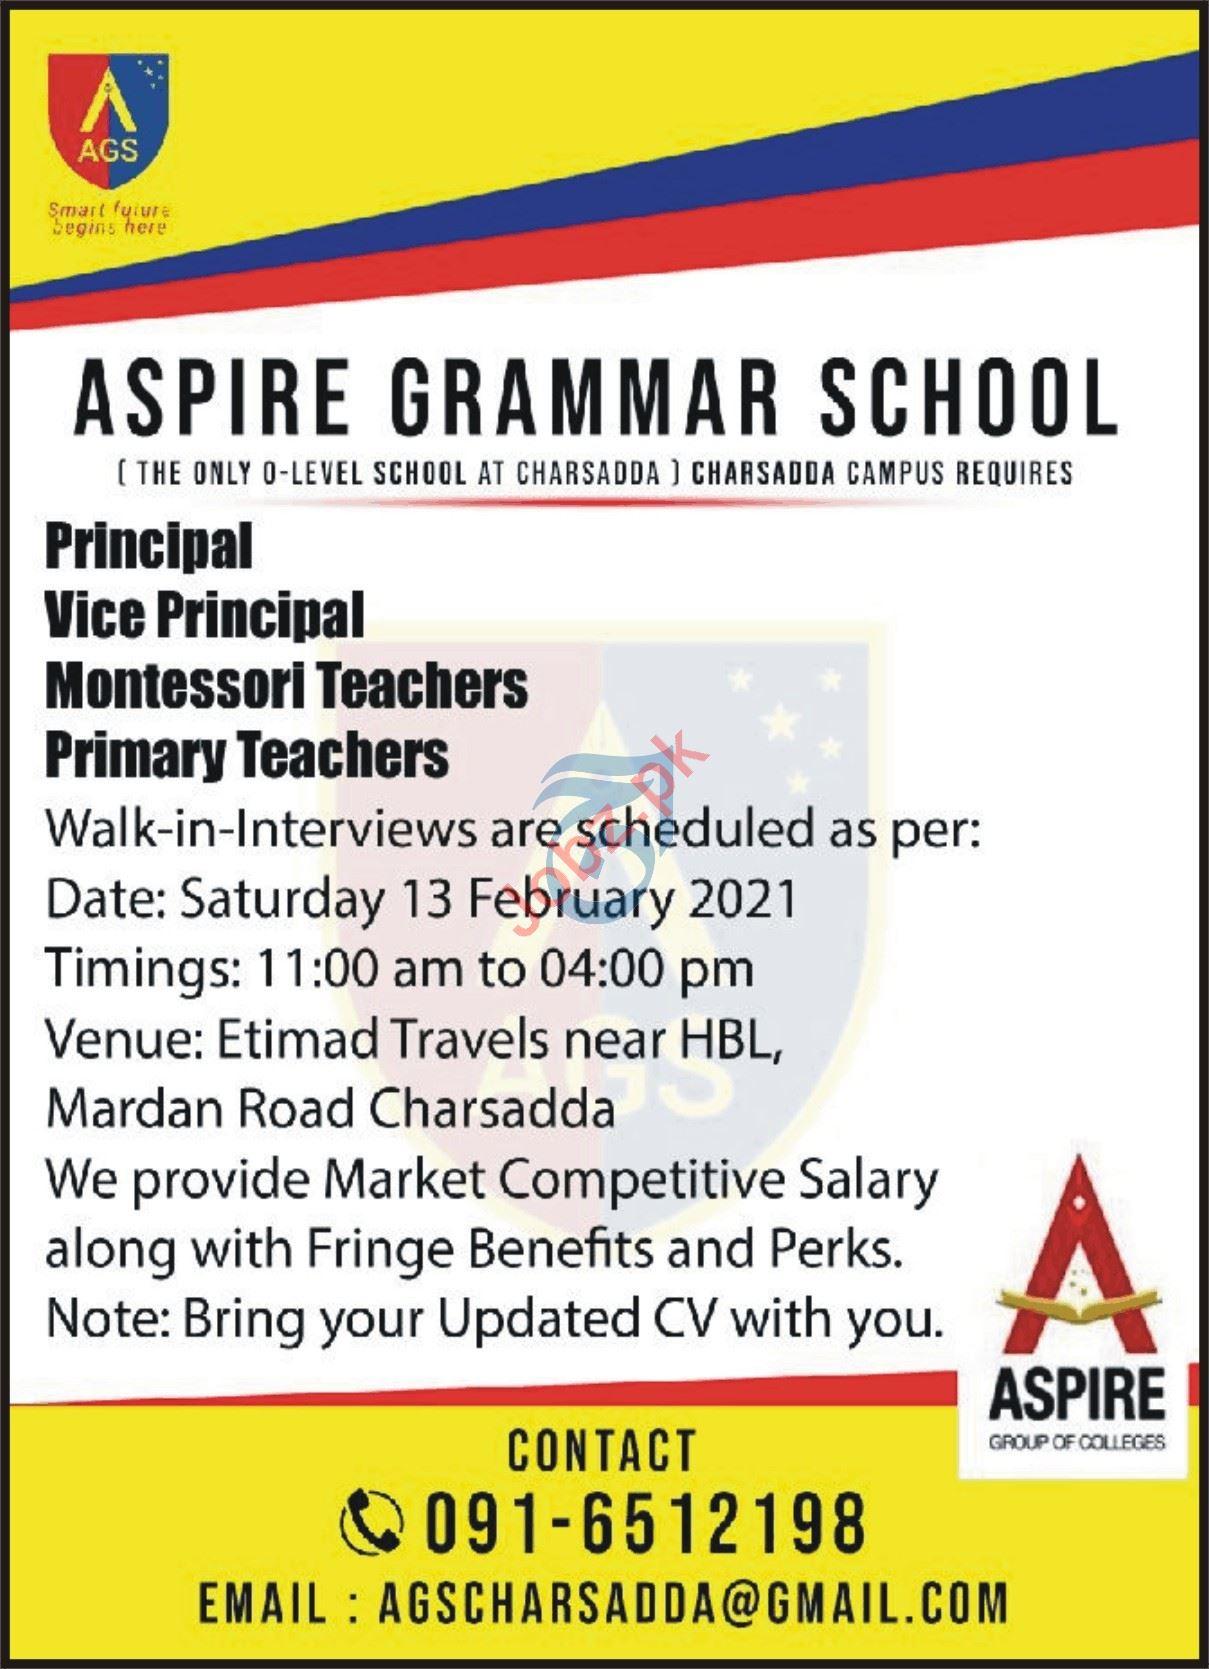 Aspire Grammar School Charsadda Campus Jobs 2021